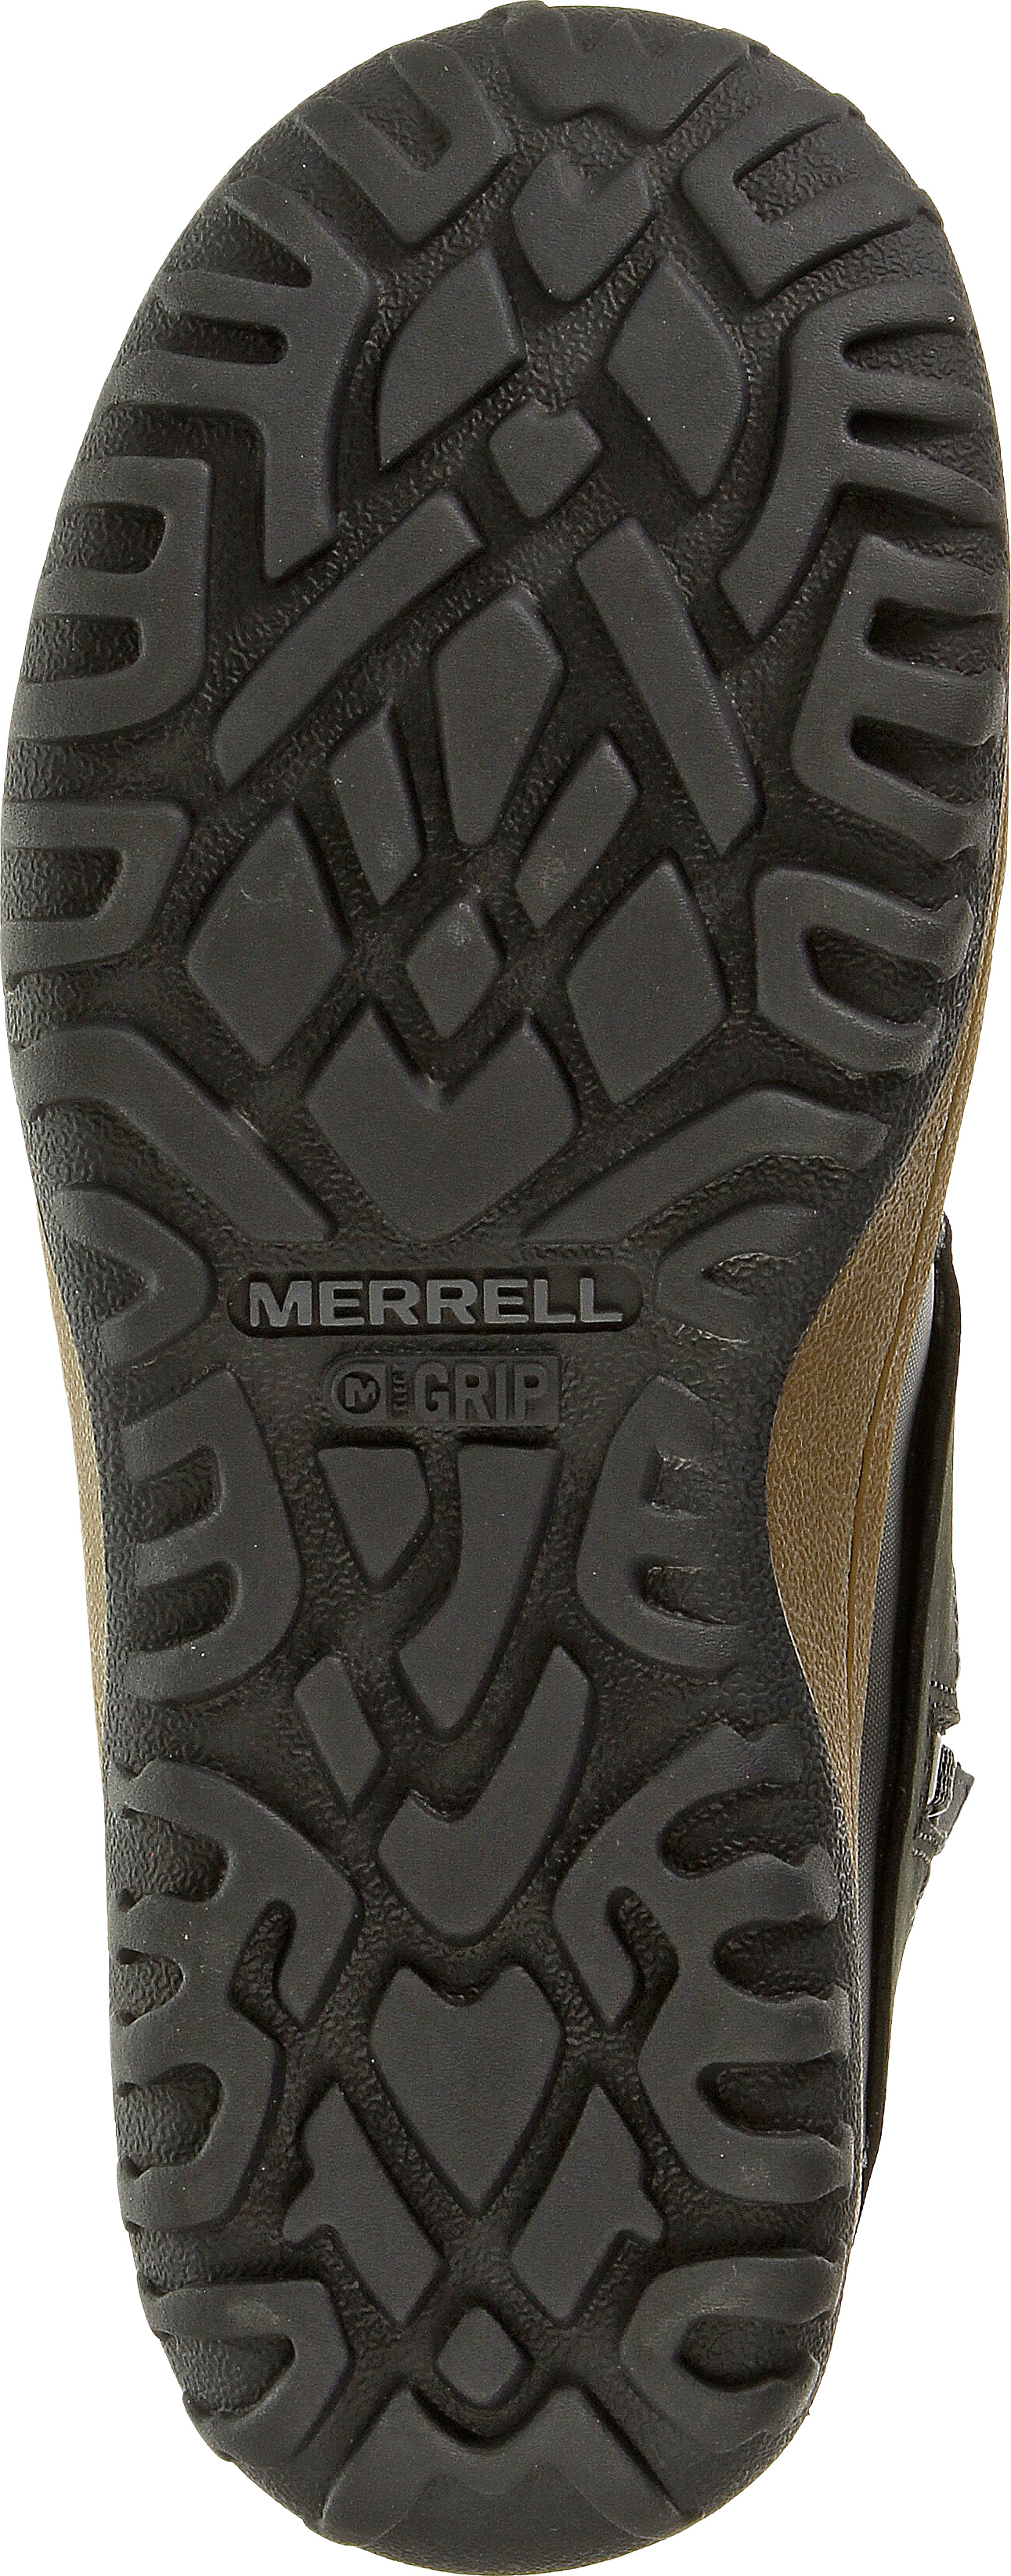 info for 61072 35202 Merrell Decora Bolero Waterproof Winter Boots - Women's | MEC